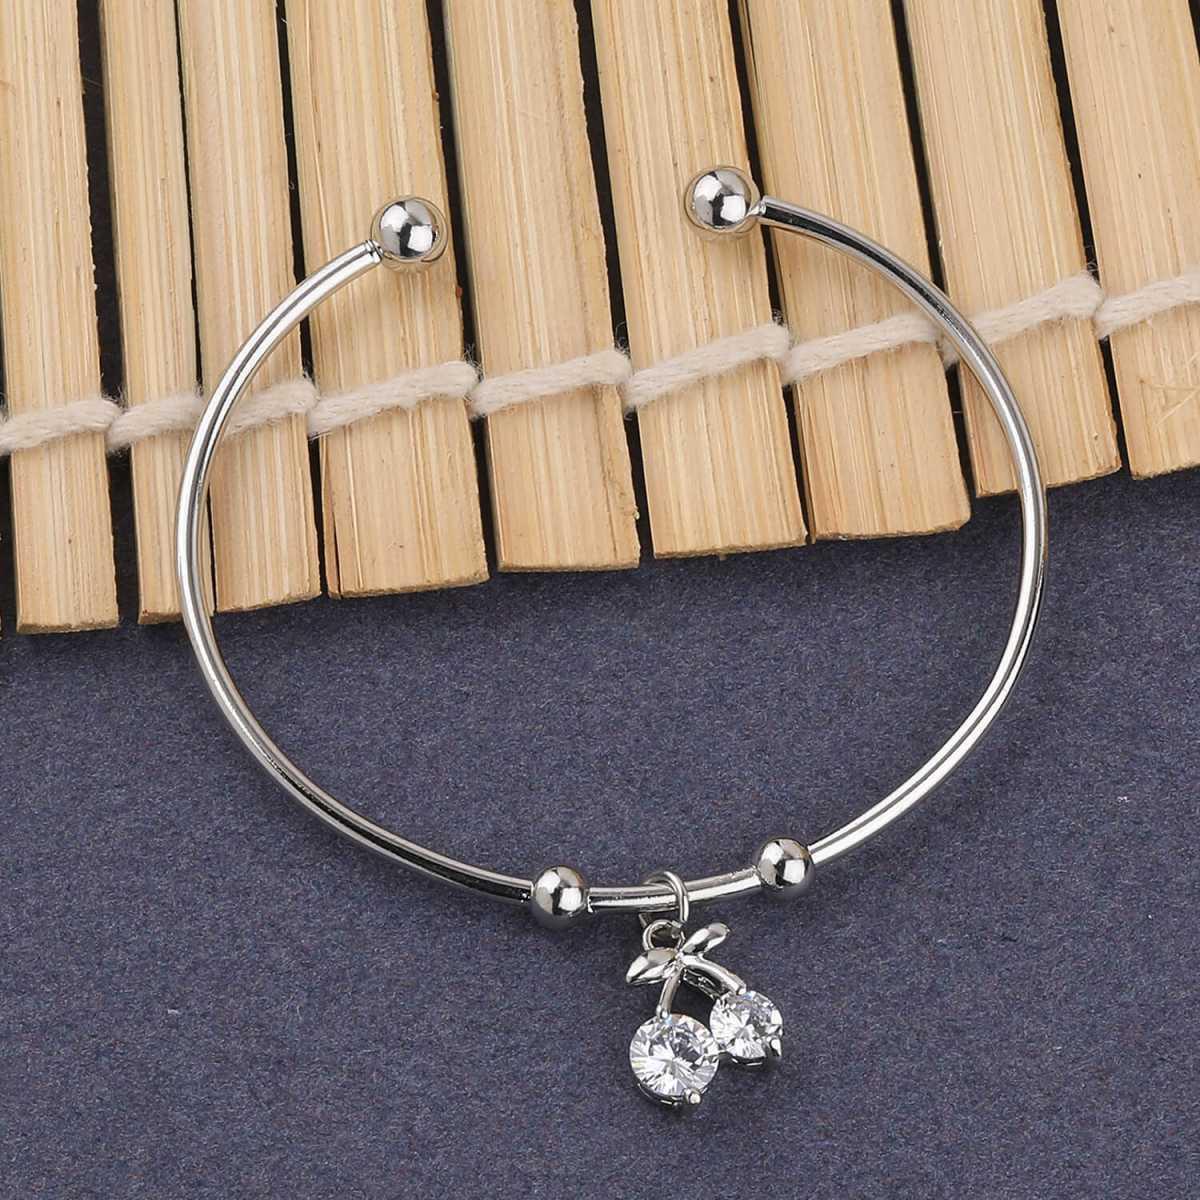 SILVER SHINE Antique Silver Plated Adjustable Diamond Bracelet For Women Girls